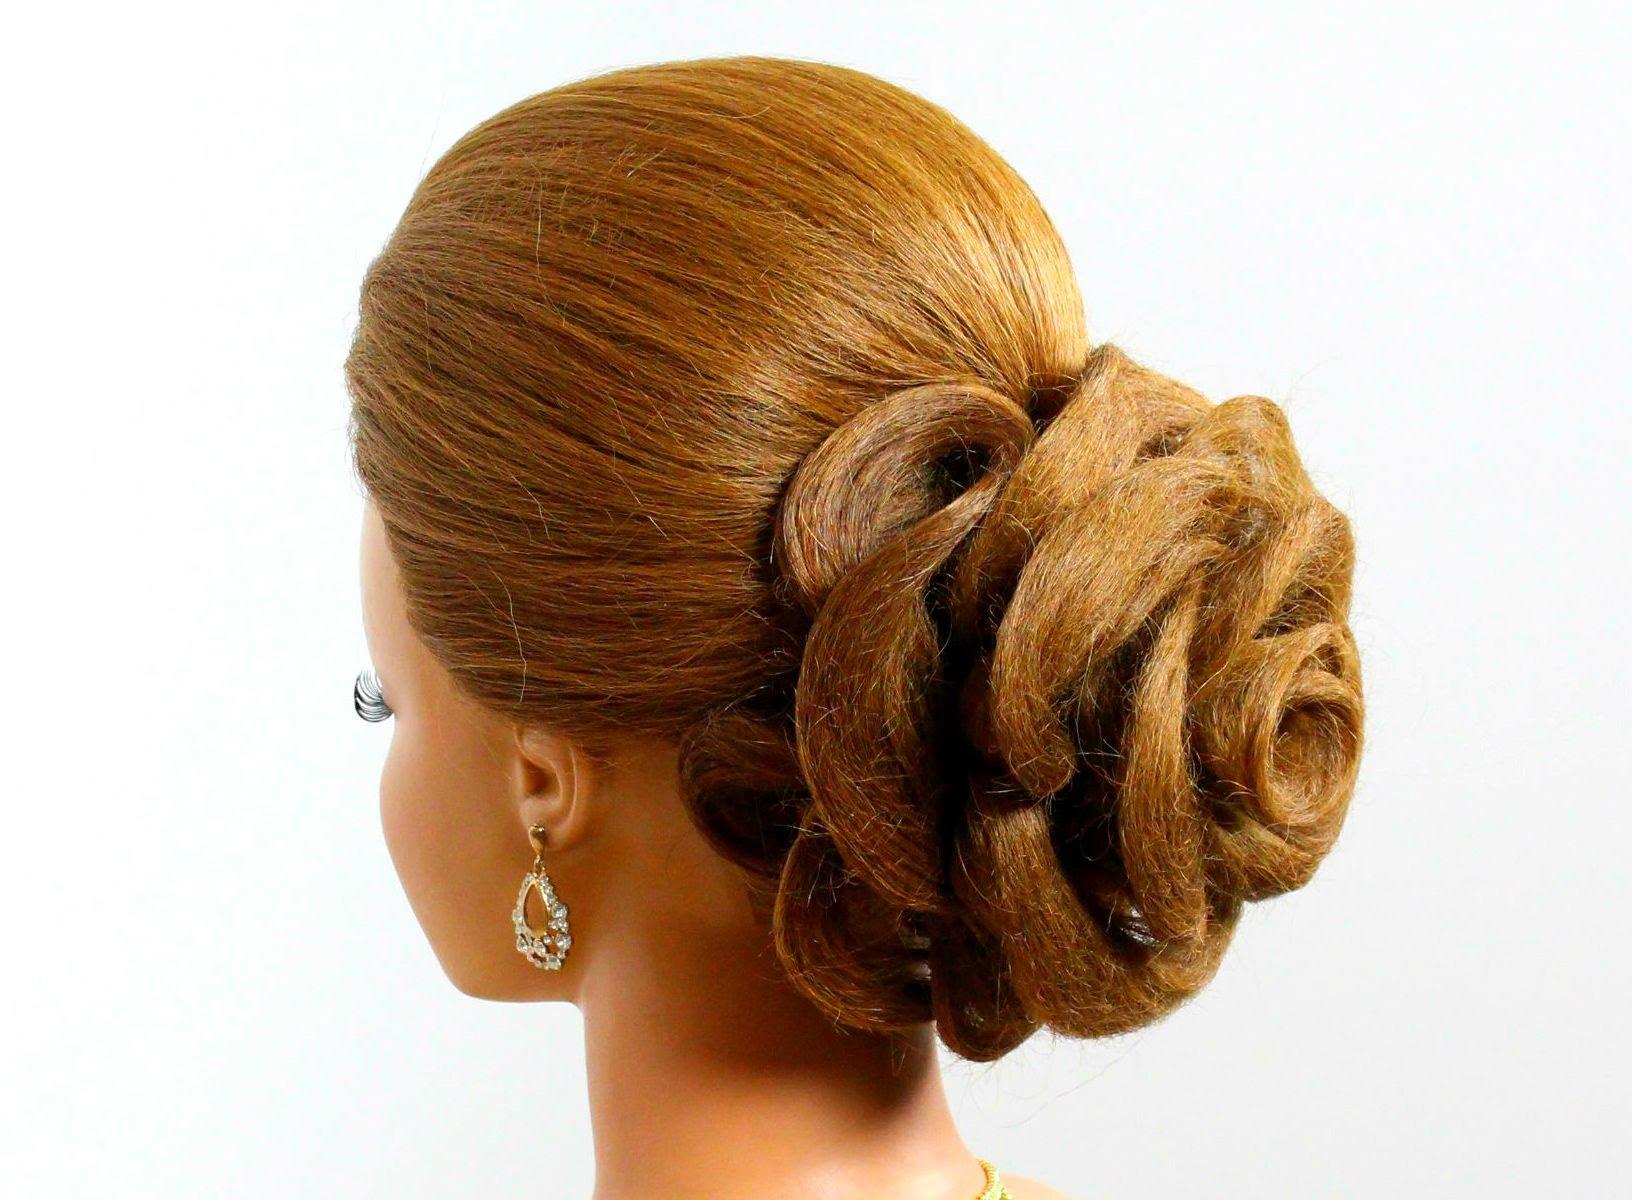 Free photo Rose Hairstyle , Bridal, Woman, Wedding , Free